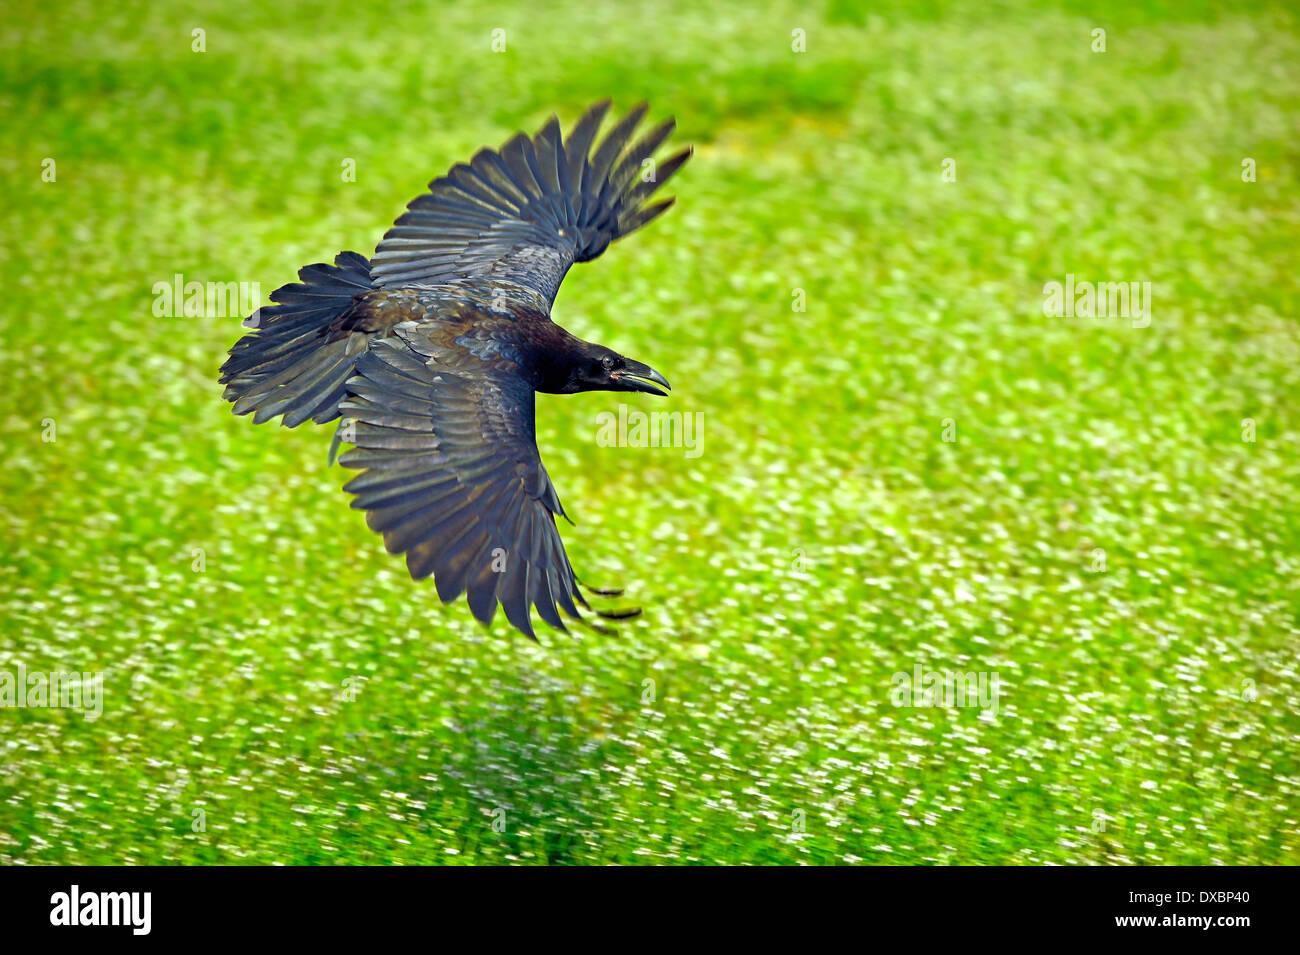 Nord- oder gemeinsame Raven (Corvus Corax) im Flug Stockbild